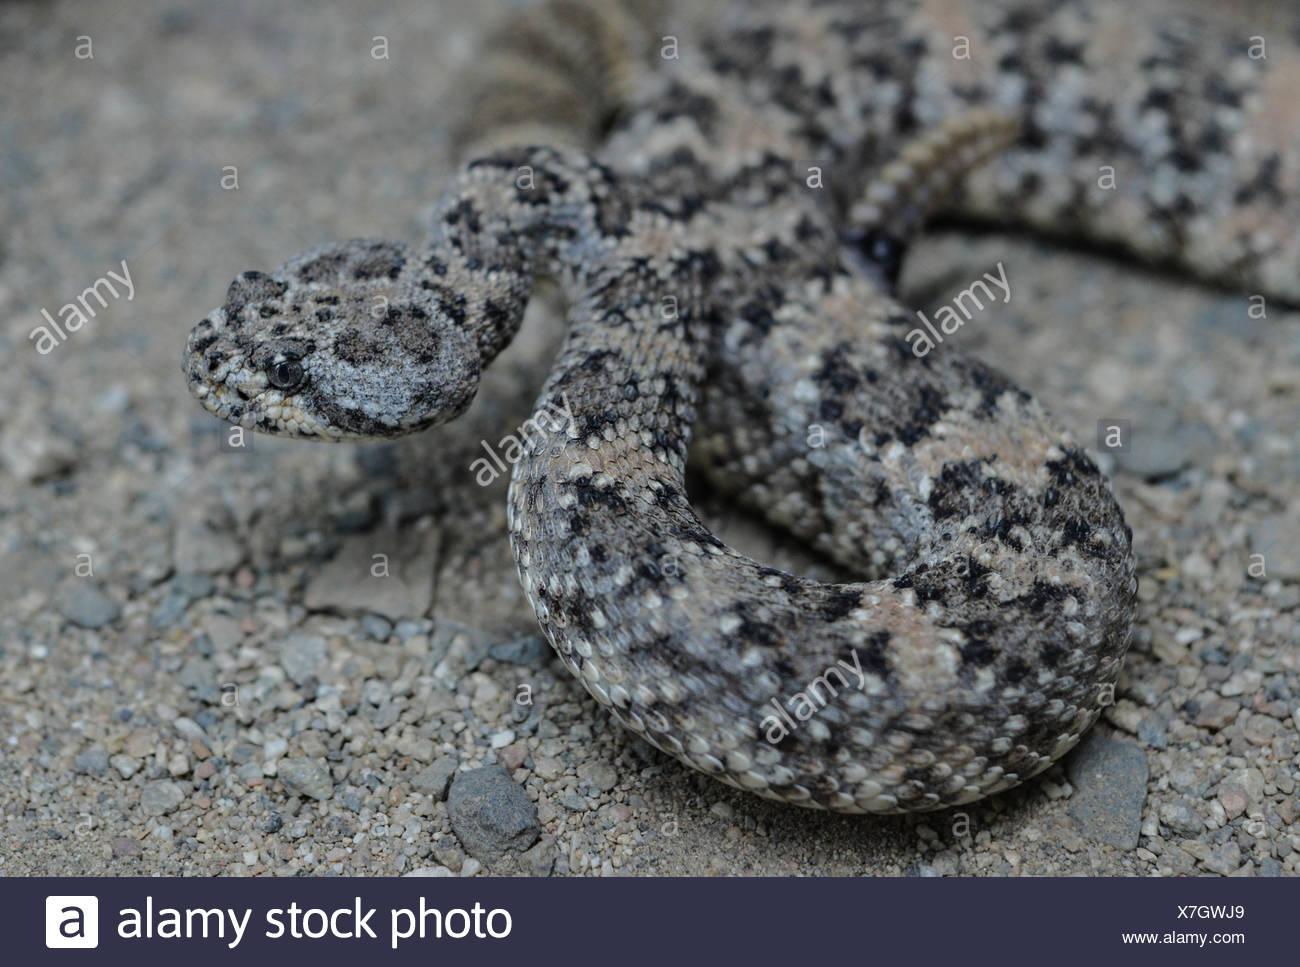 A California Rattlesnake prepares to strike in the desert of Southern California. - Stock Image